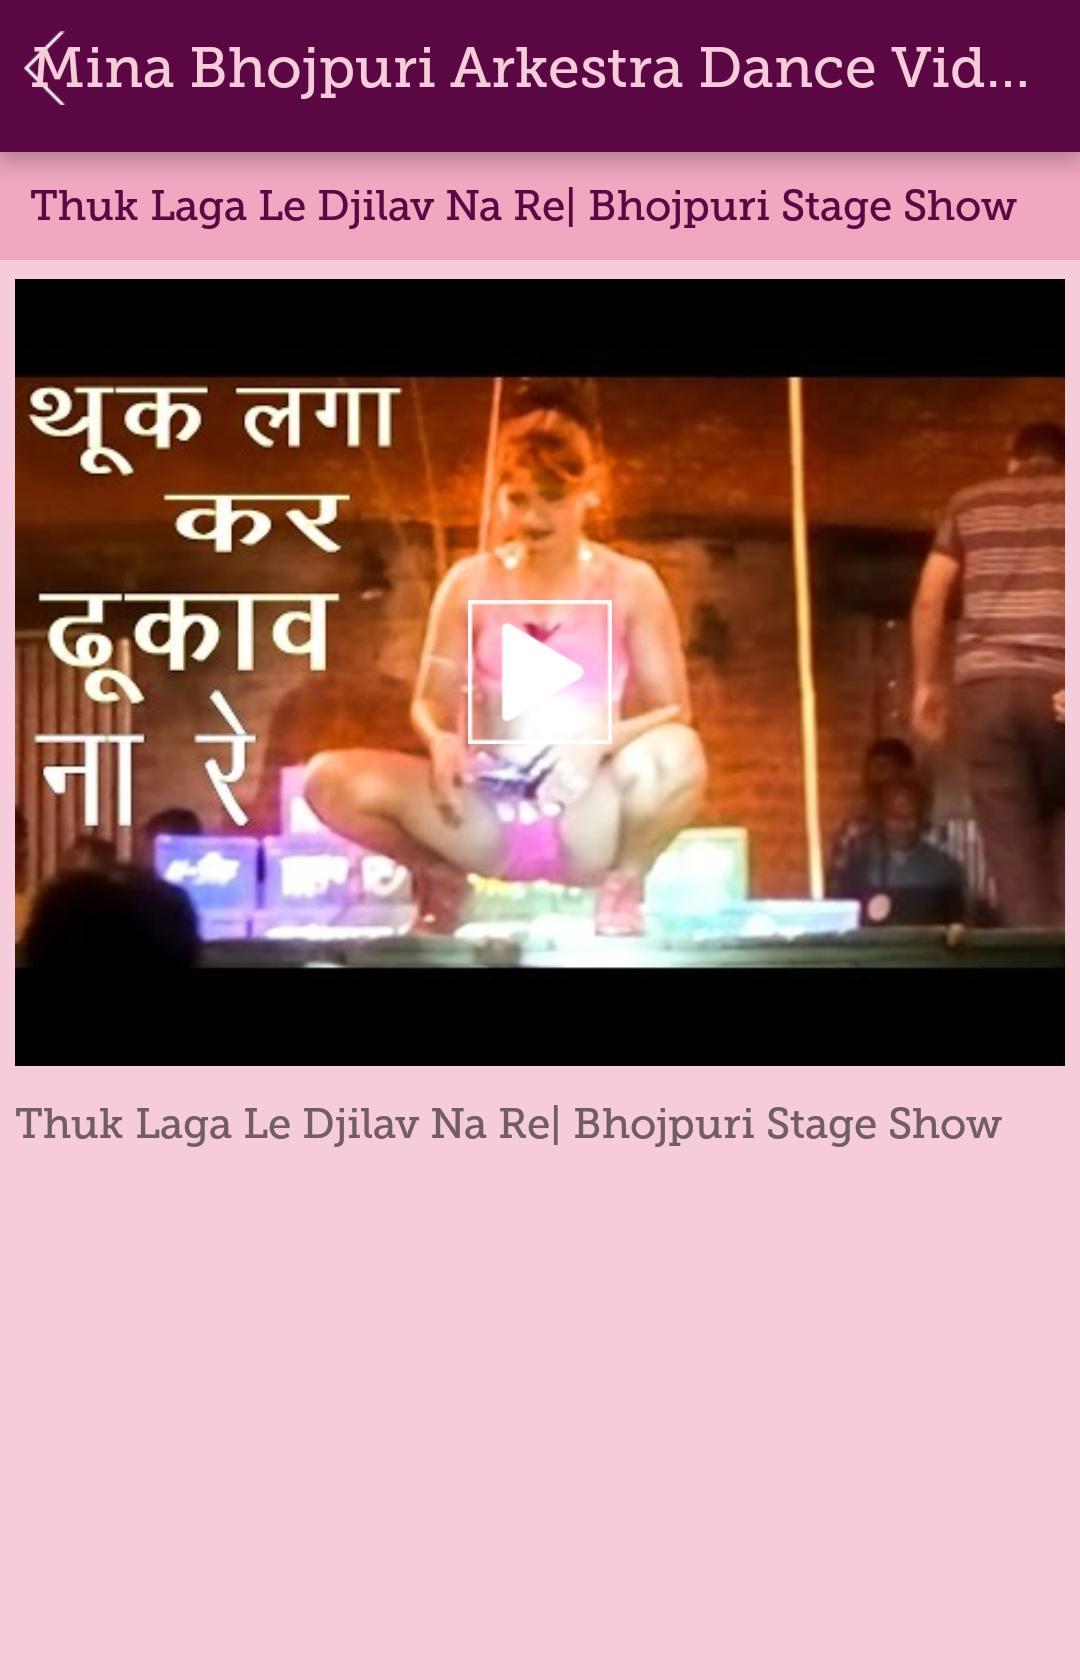 Bhojpuri Arkestra Video Song (Stage Dance Program) for